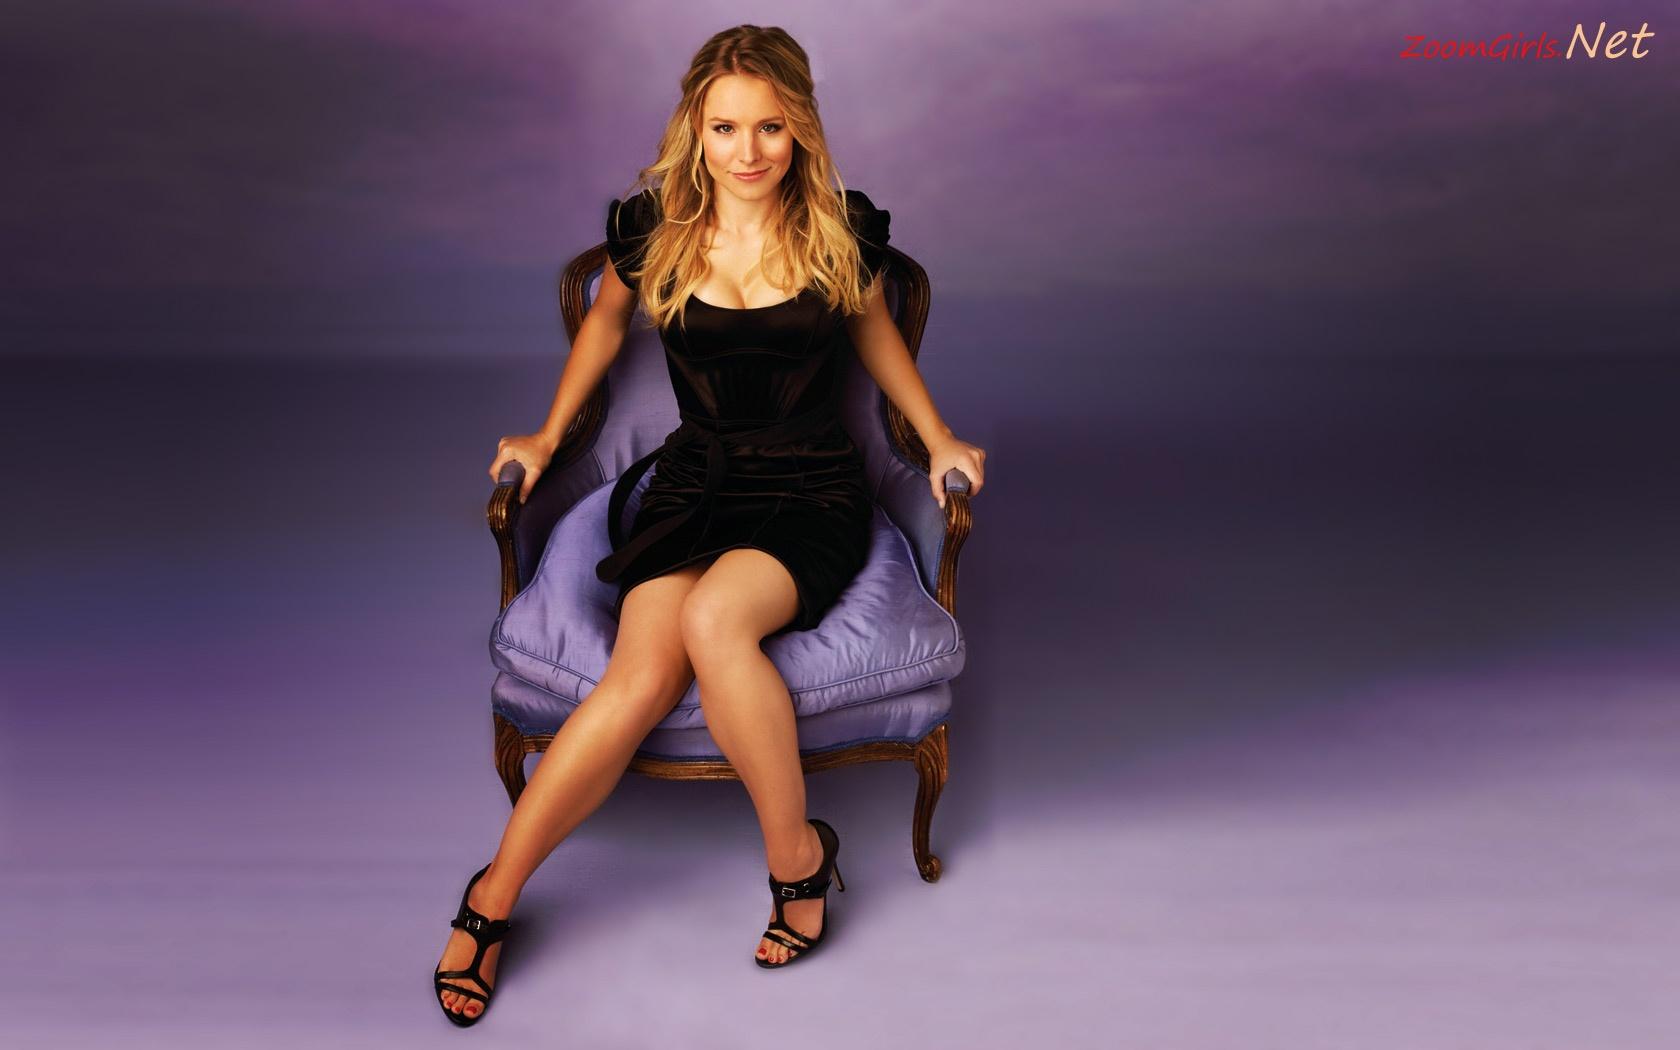 Kristen Bell Wallpaper, sexy heroes tv show actress